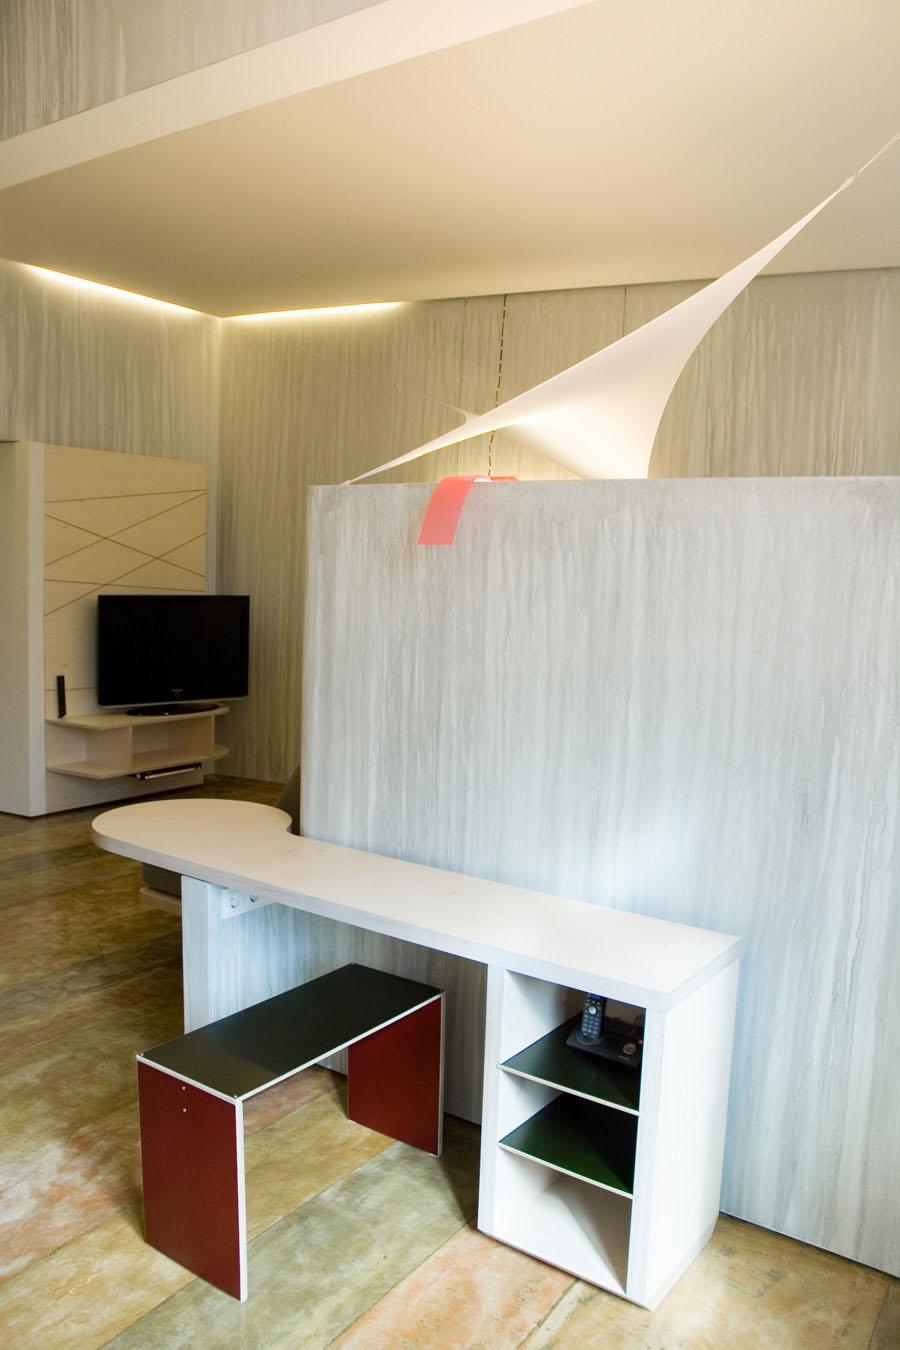 Freydenberg_Apartment_Hotel_41.jpg